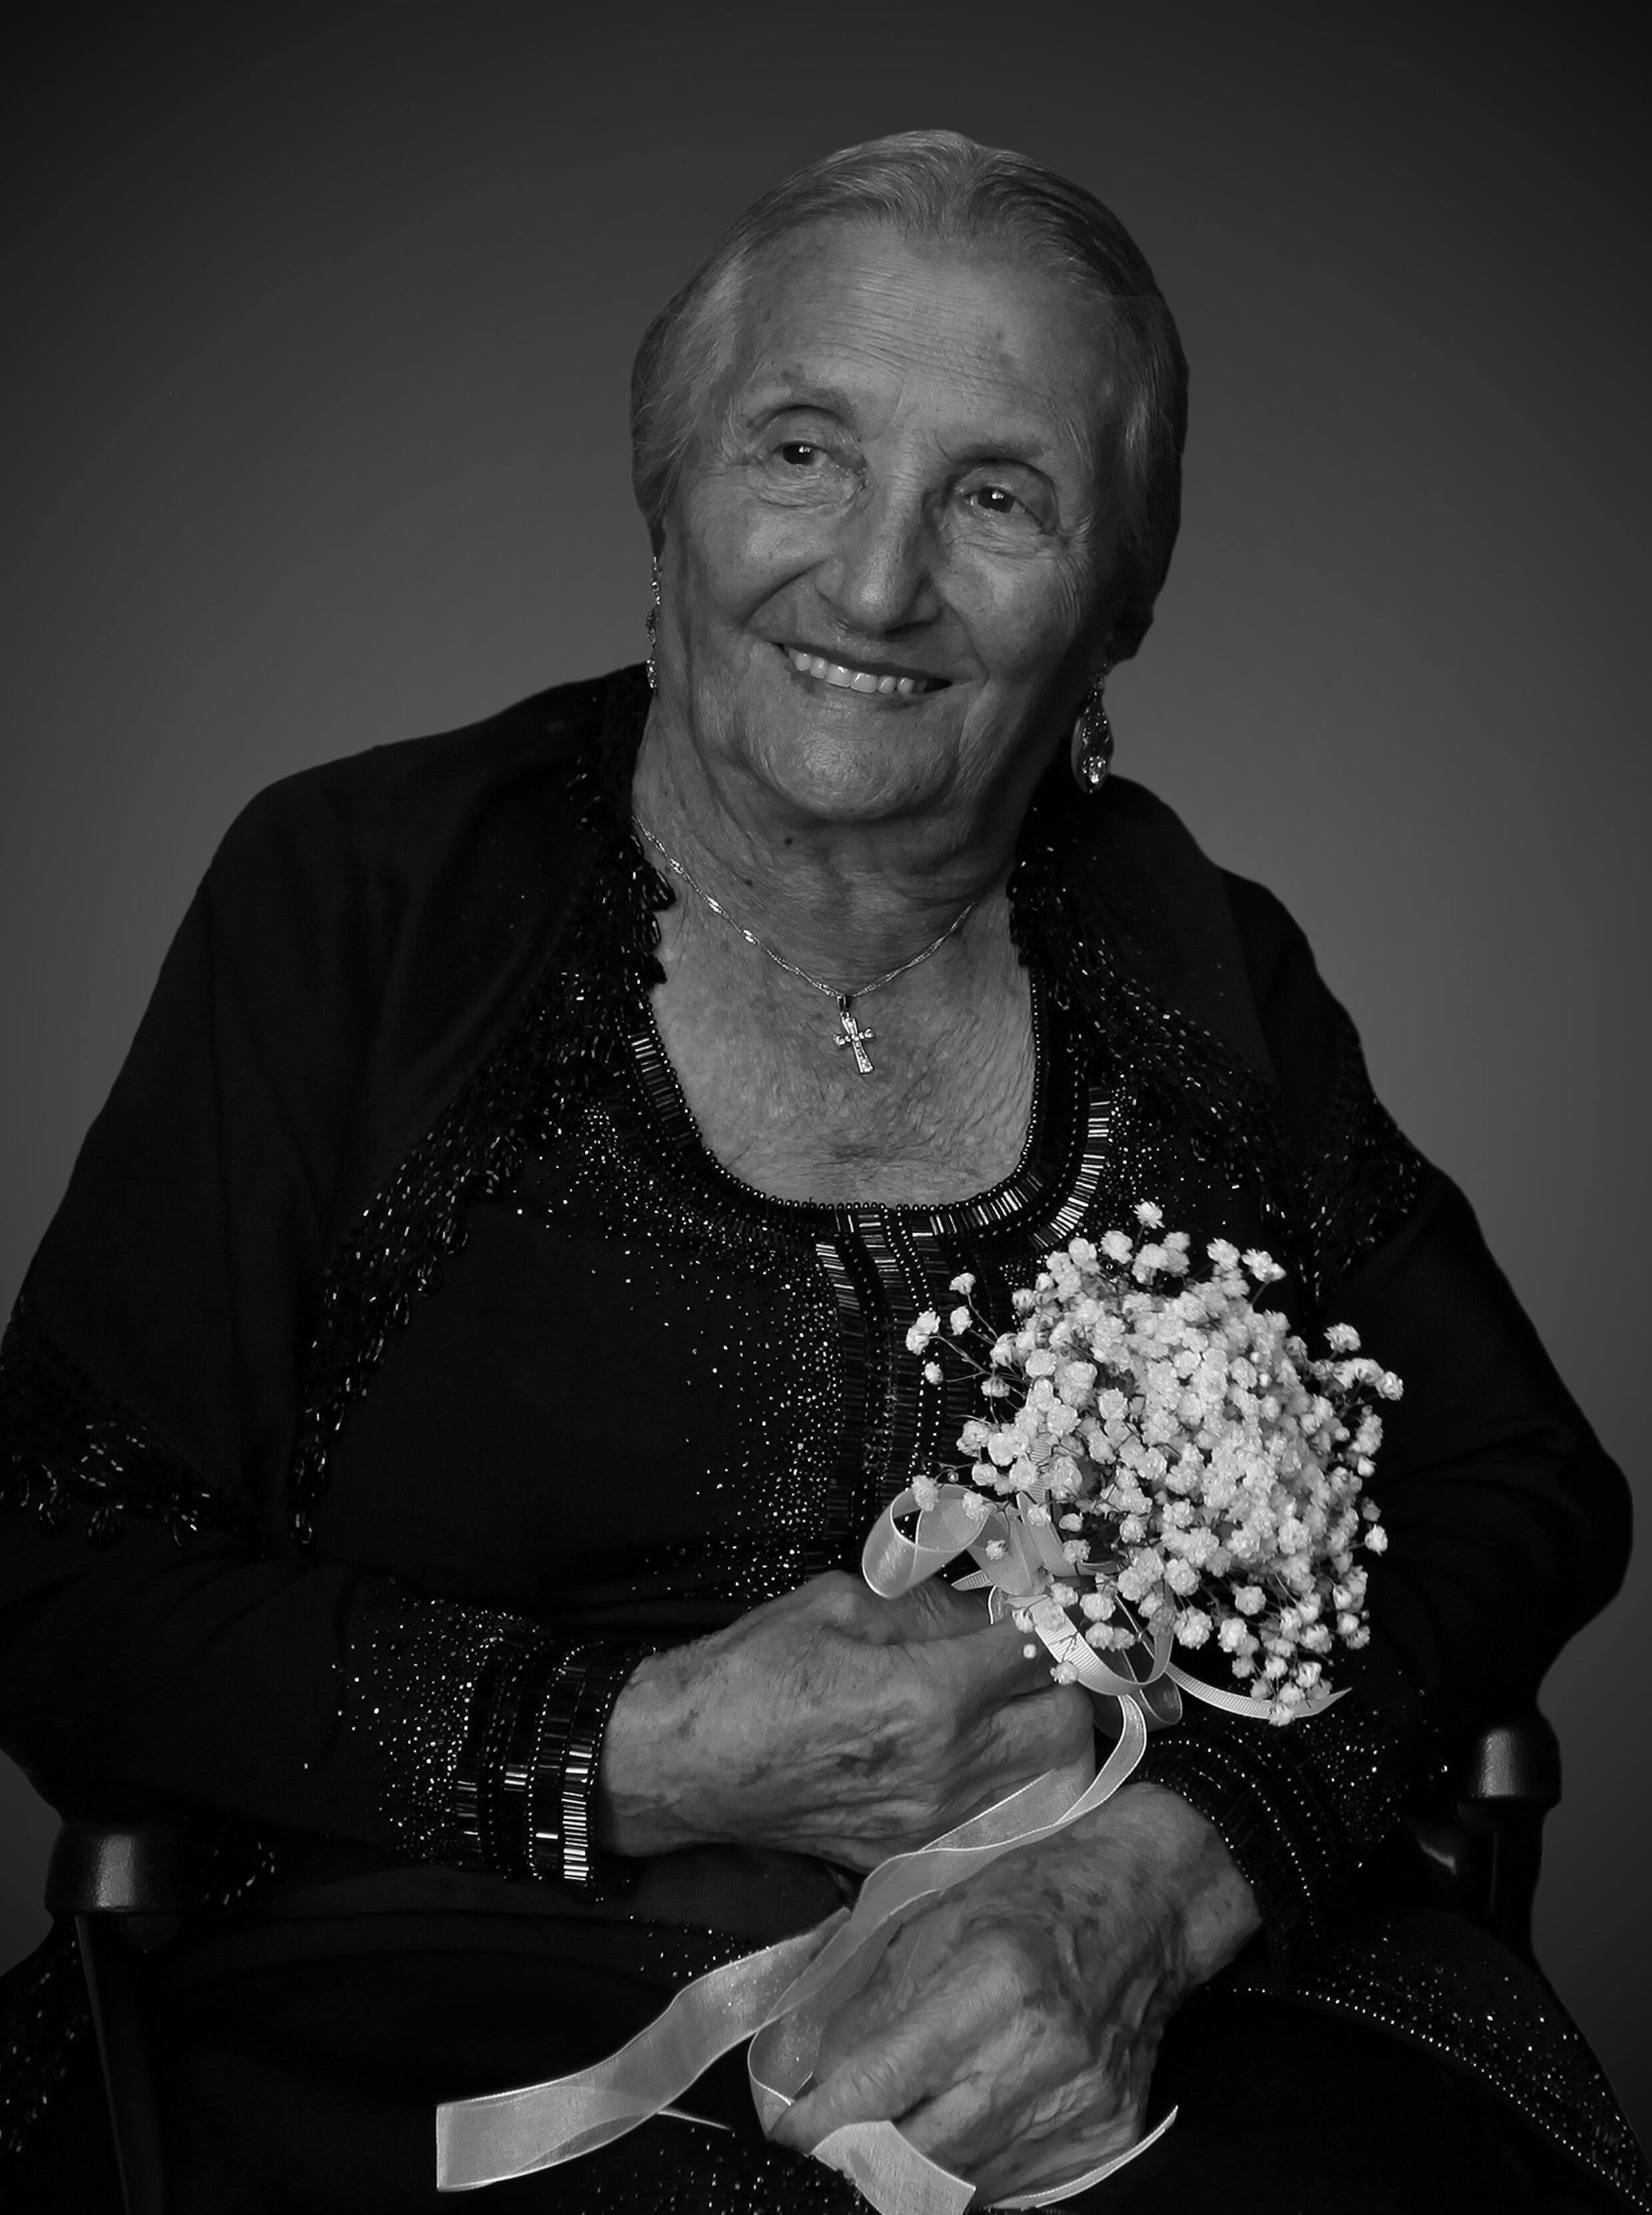 Роза Буглион, урожденная Розали Ван Беен